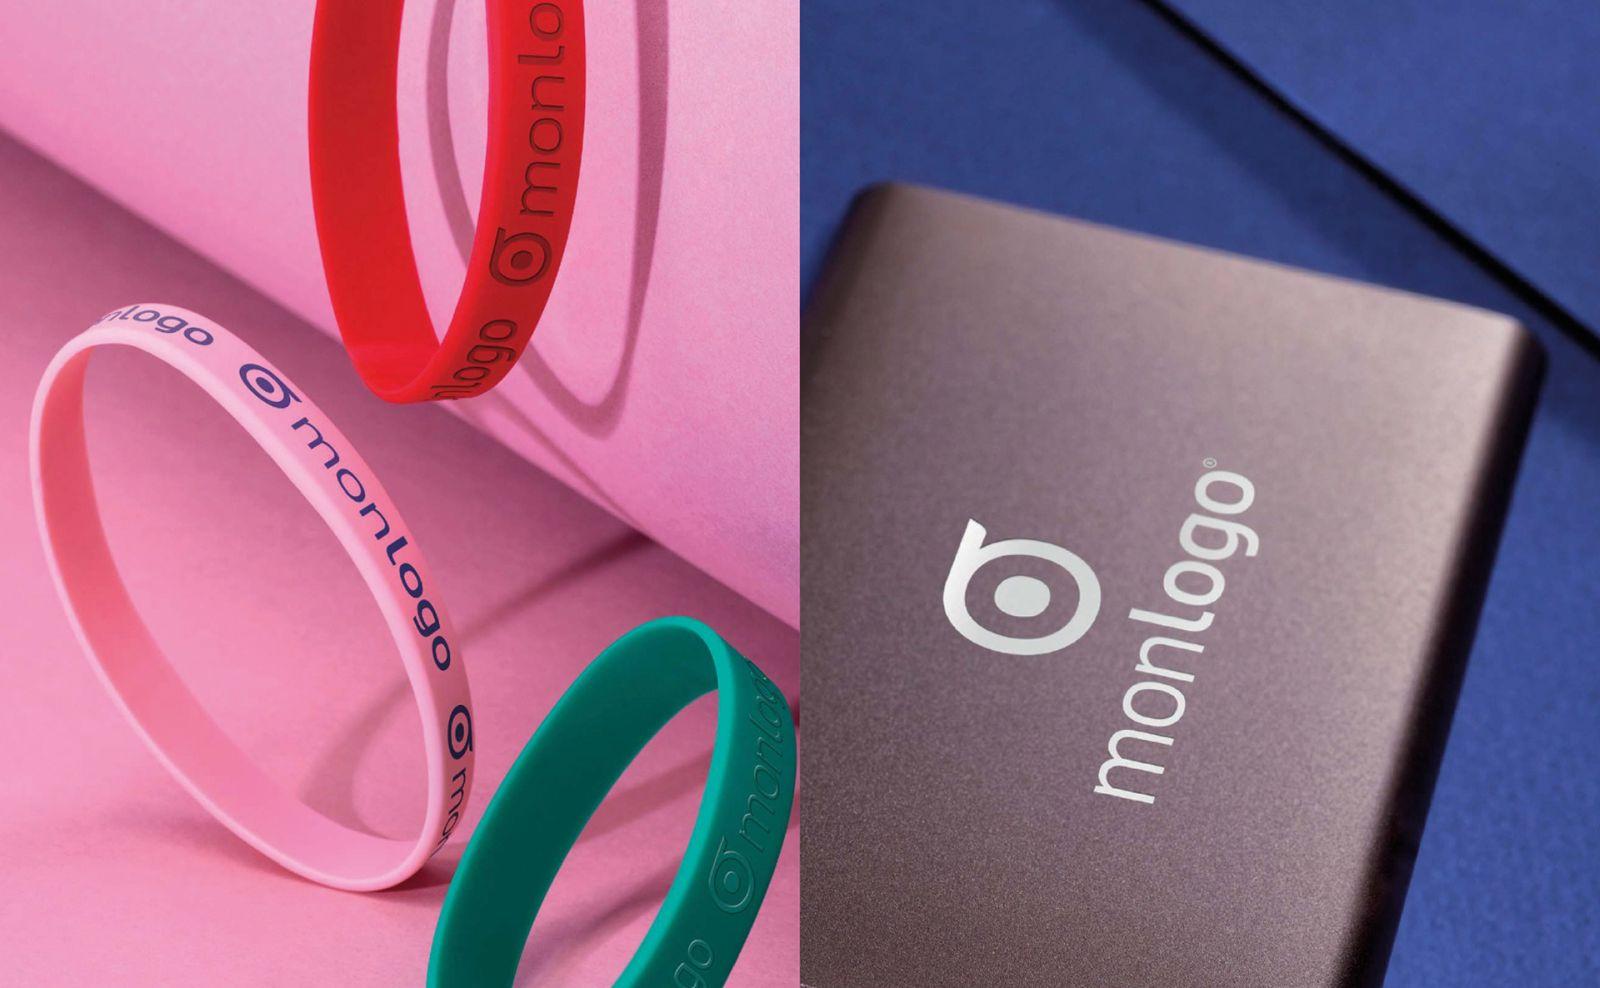 branding design logo identity objetrama wristband